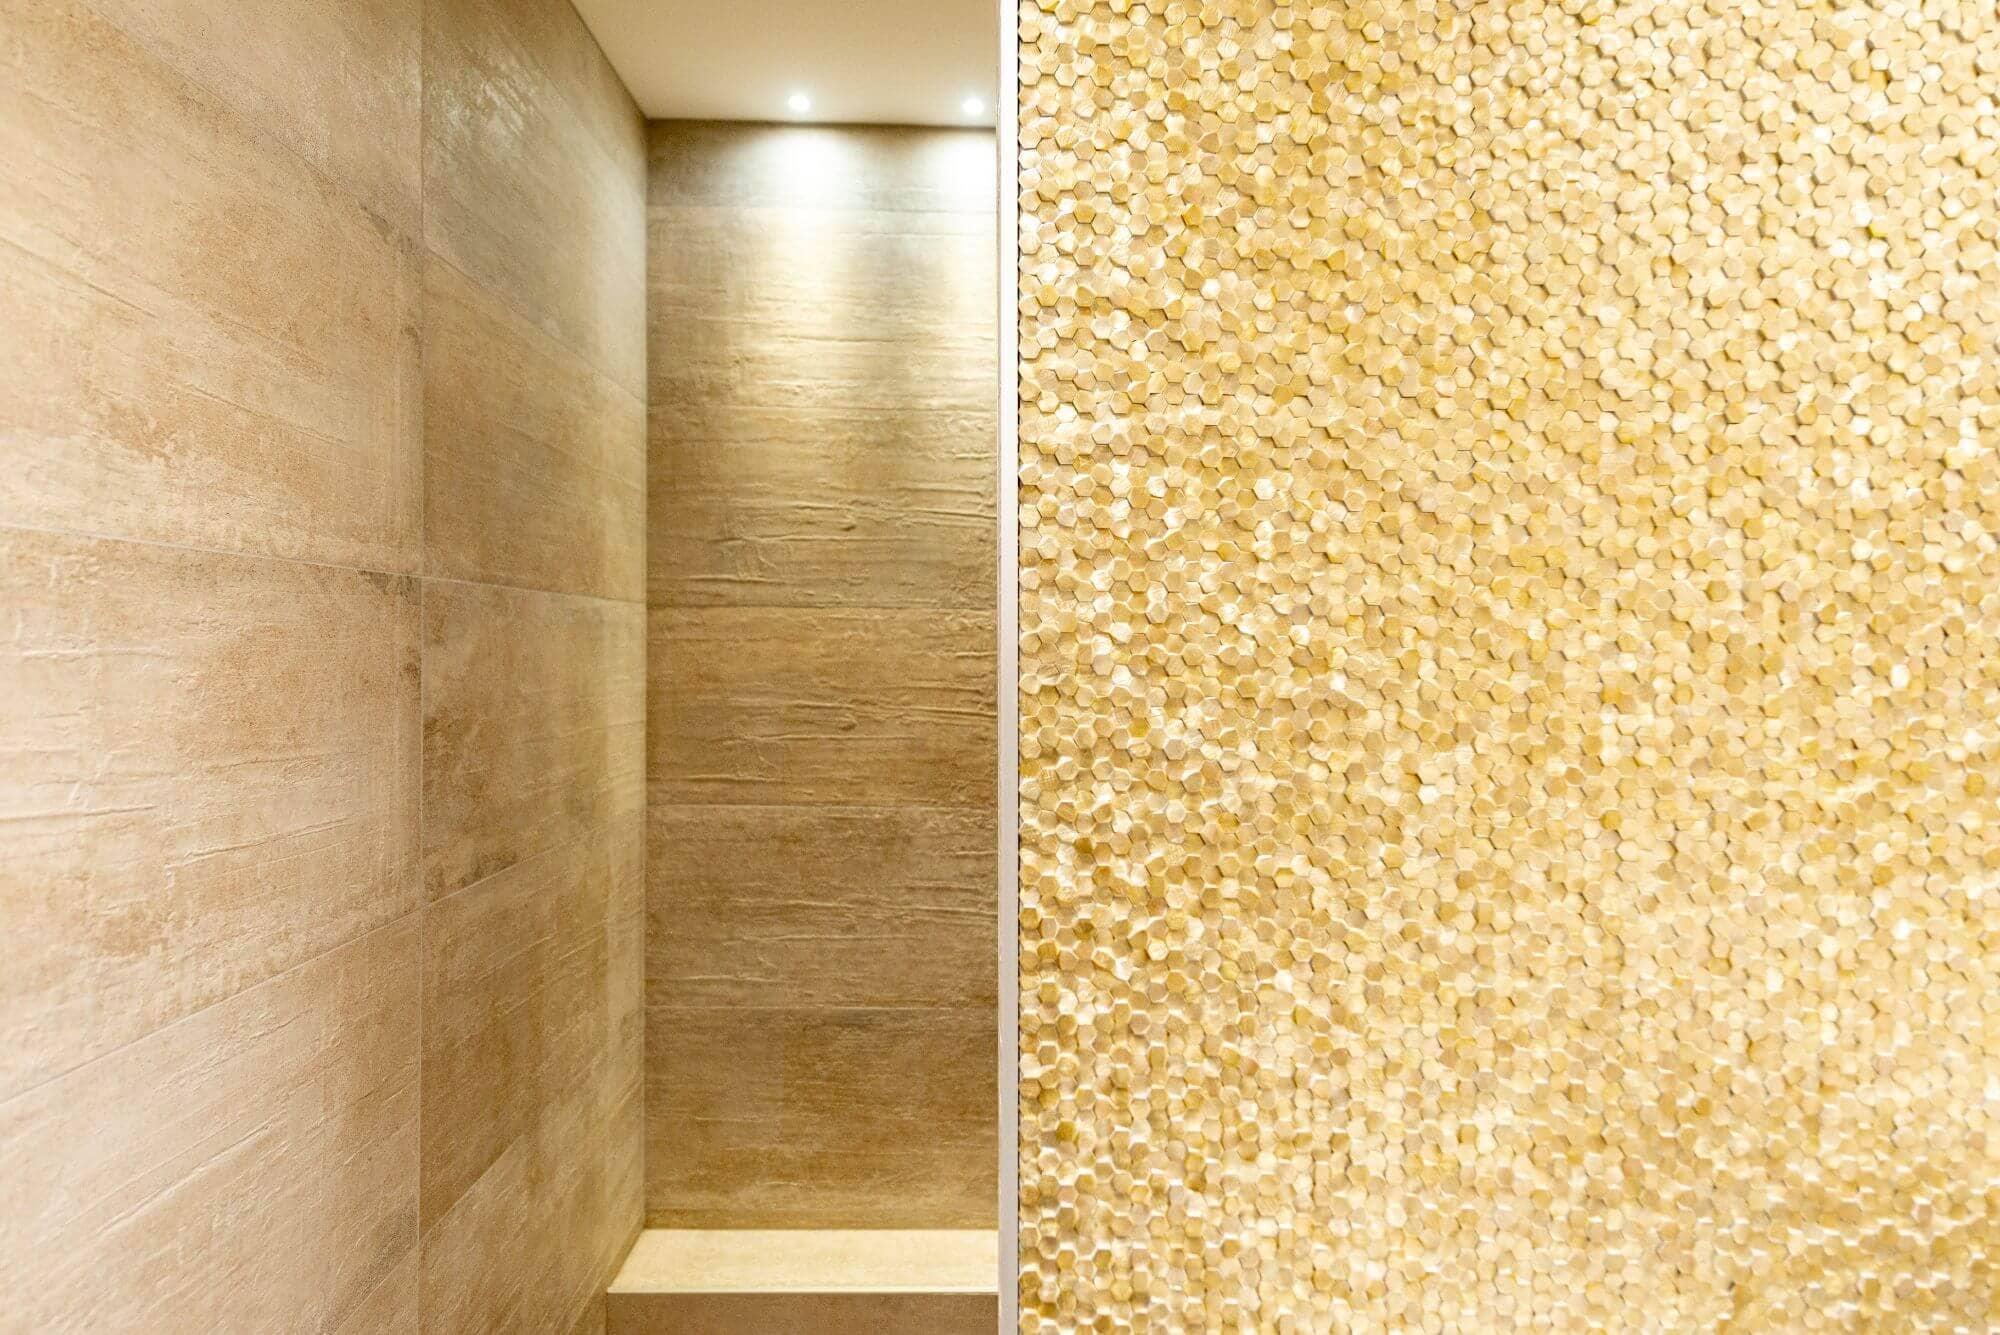 Carreaux, Relief, Carrelage or, Salle de bain